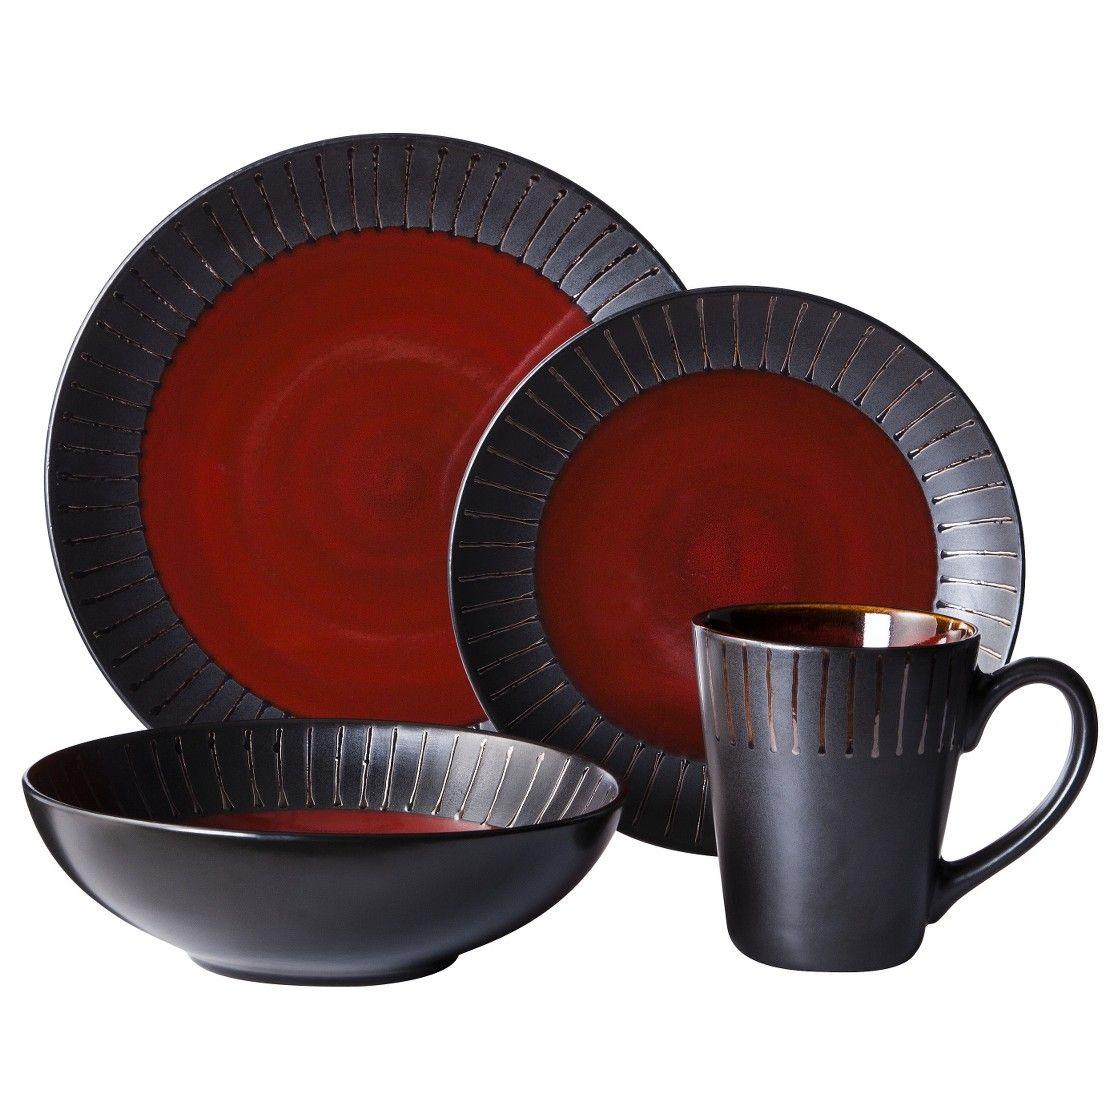 Threshold� 16 Piece Lawrence Dinnerware Set - Red